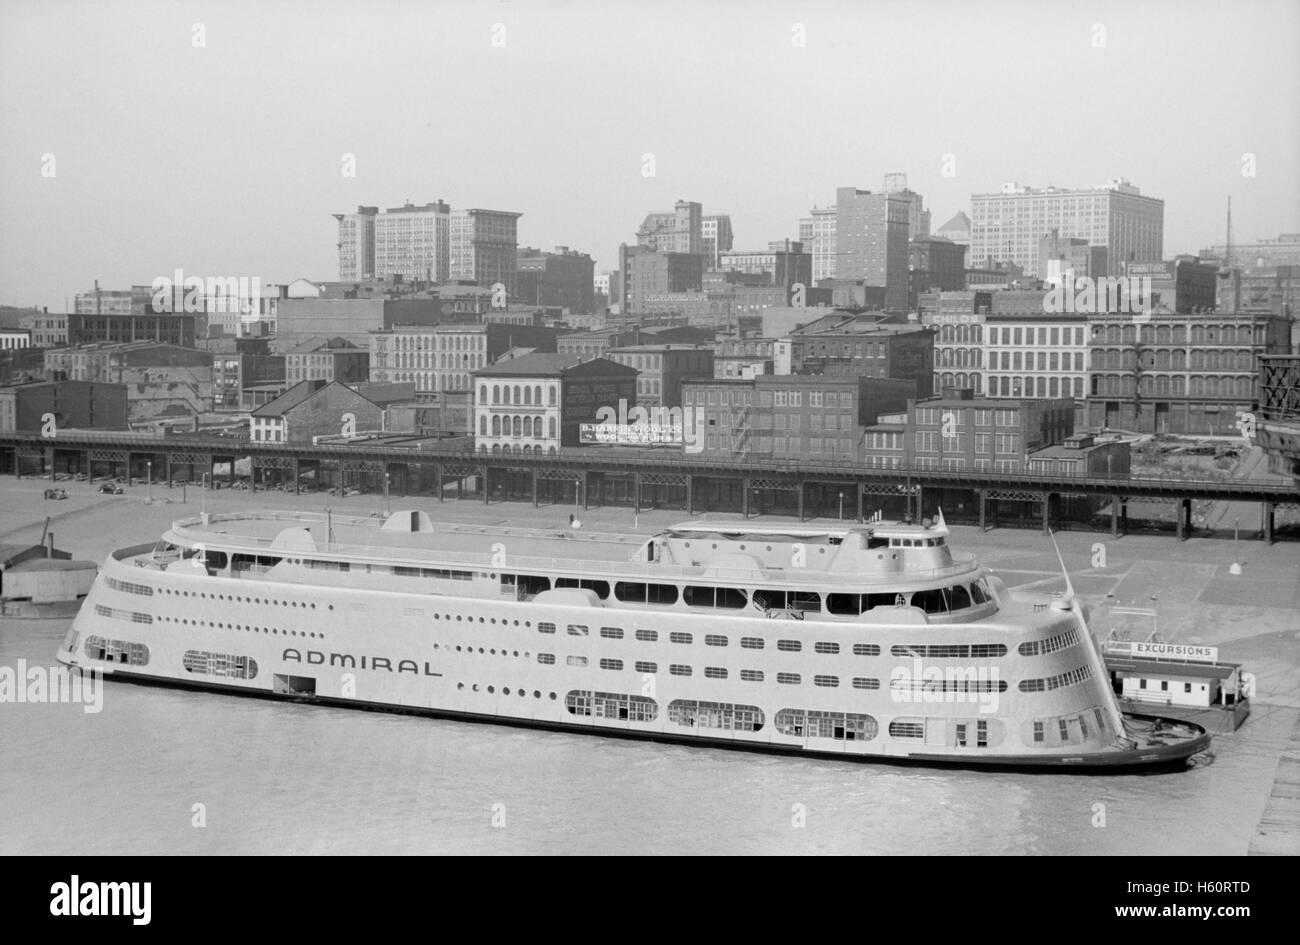 Modern Riverboat, Saint Louis, Missouri, USA, John Vachon for Office of War Information, May 1940 - Stock Image